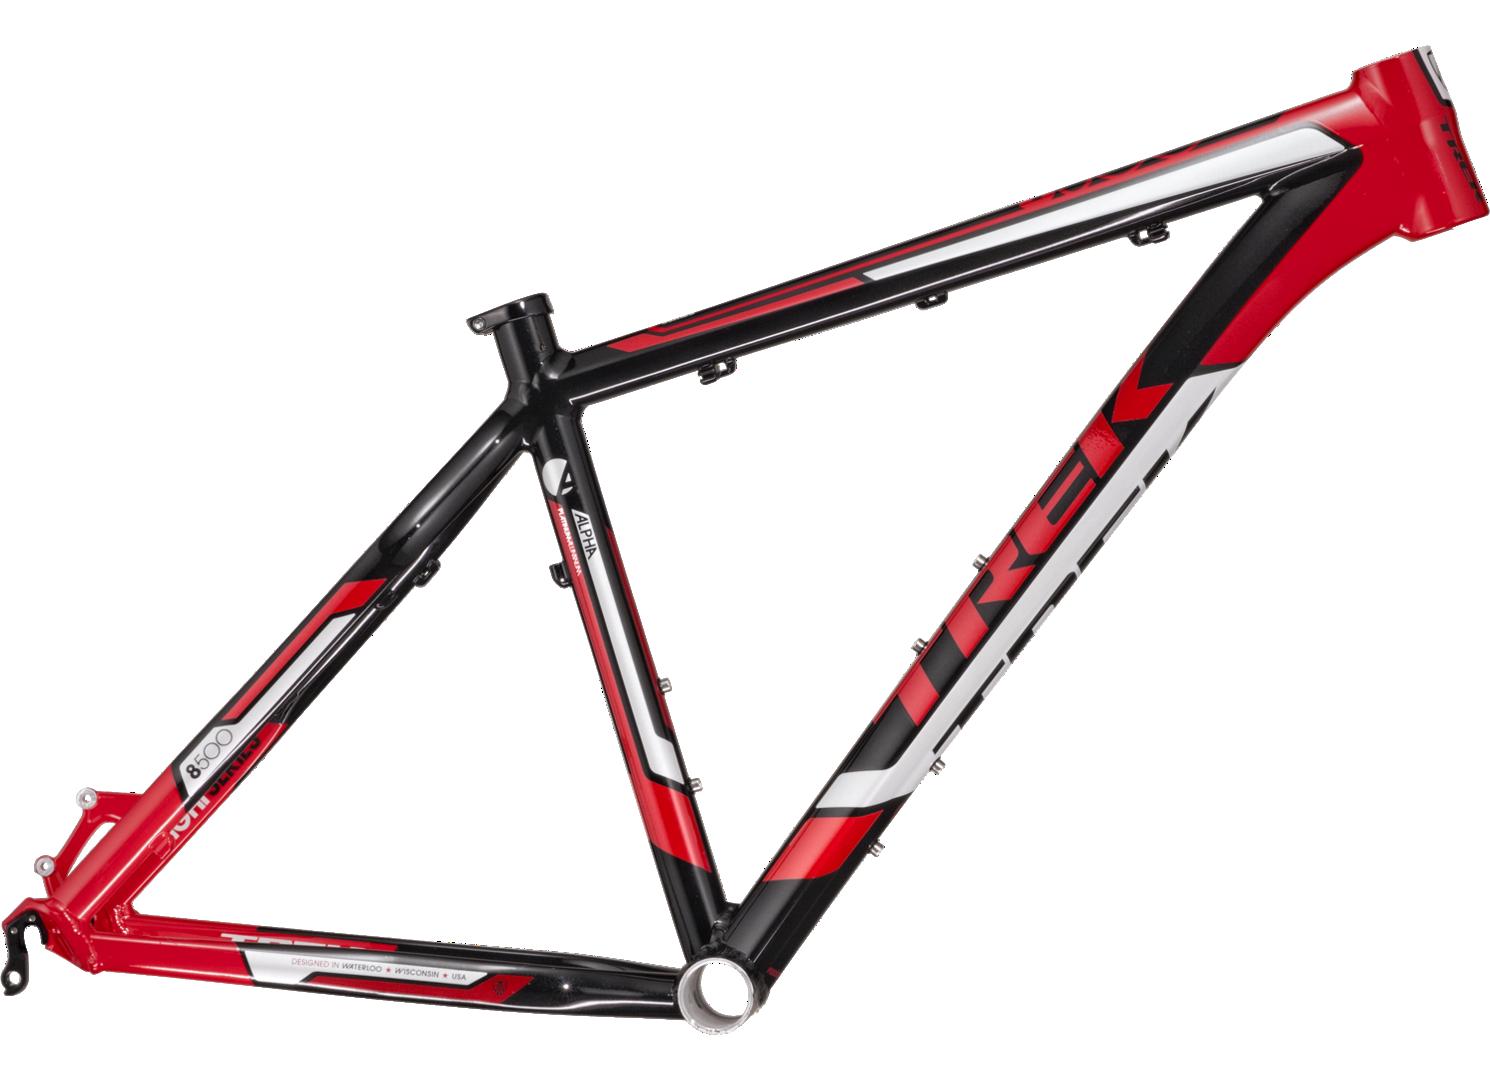 Luxury Trek Bike Frame Collection - Picture Frame Ideas ...